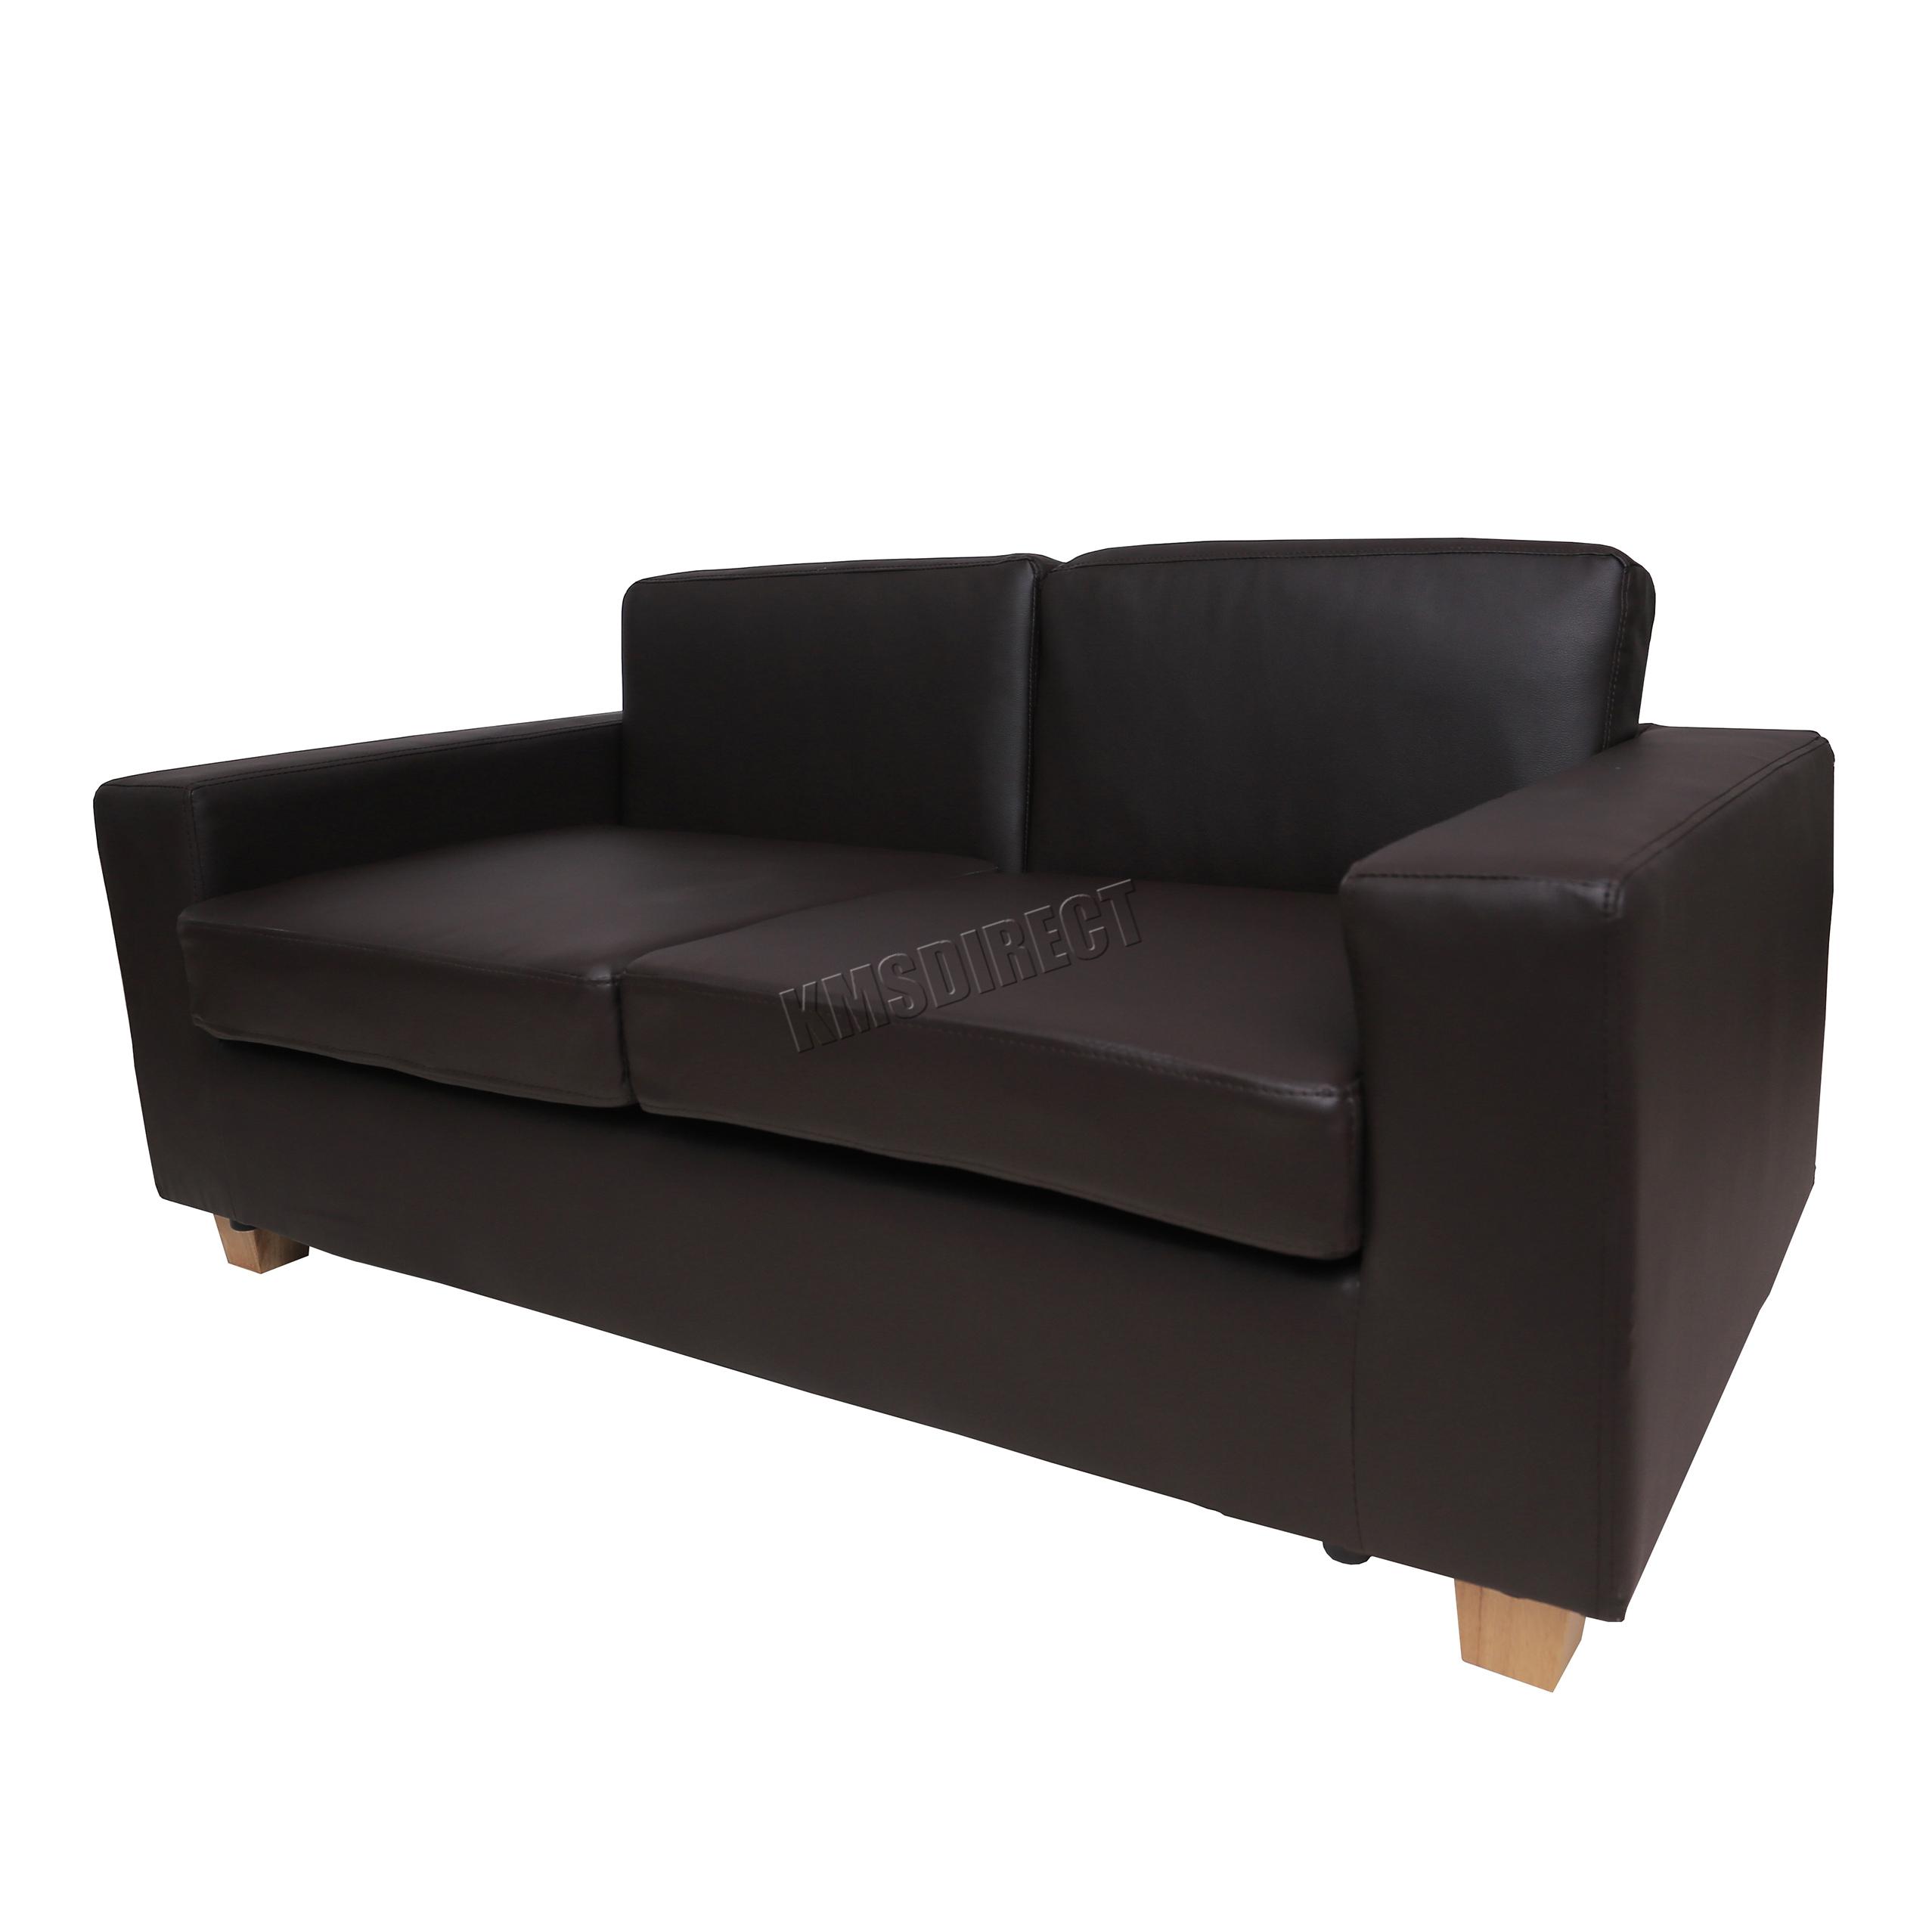 solsta sofa bed ransta dark gray 149 00 sofascore nottingham vs fulham foxhunter pu 2 seater couch livingroom lounge home